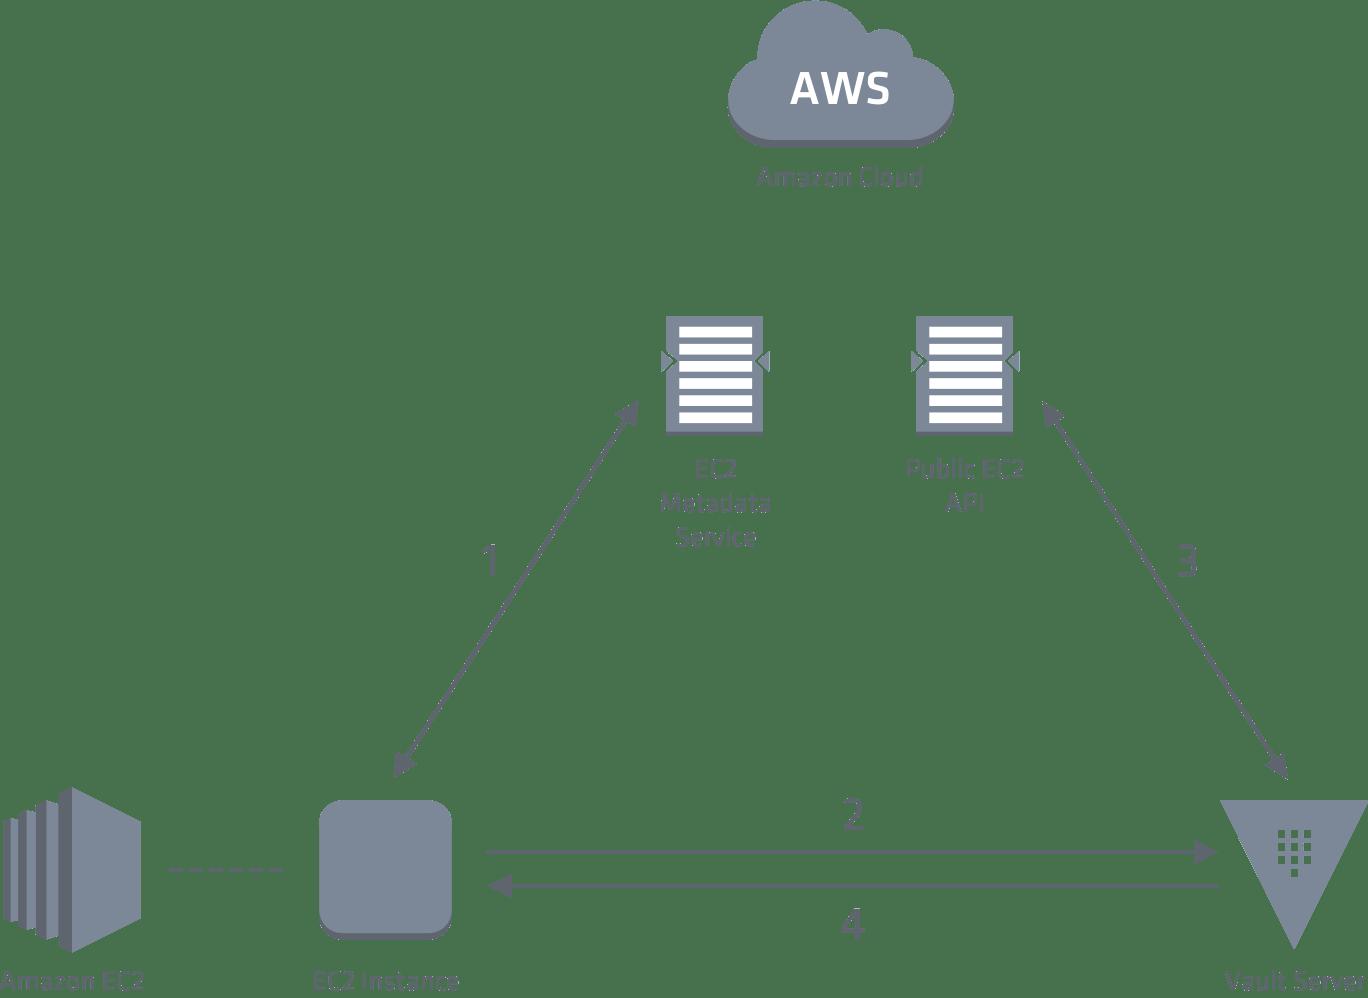 hashicorp/vault/aws | vault-ec2-auth Example | Terraform Module Registry